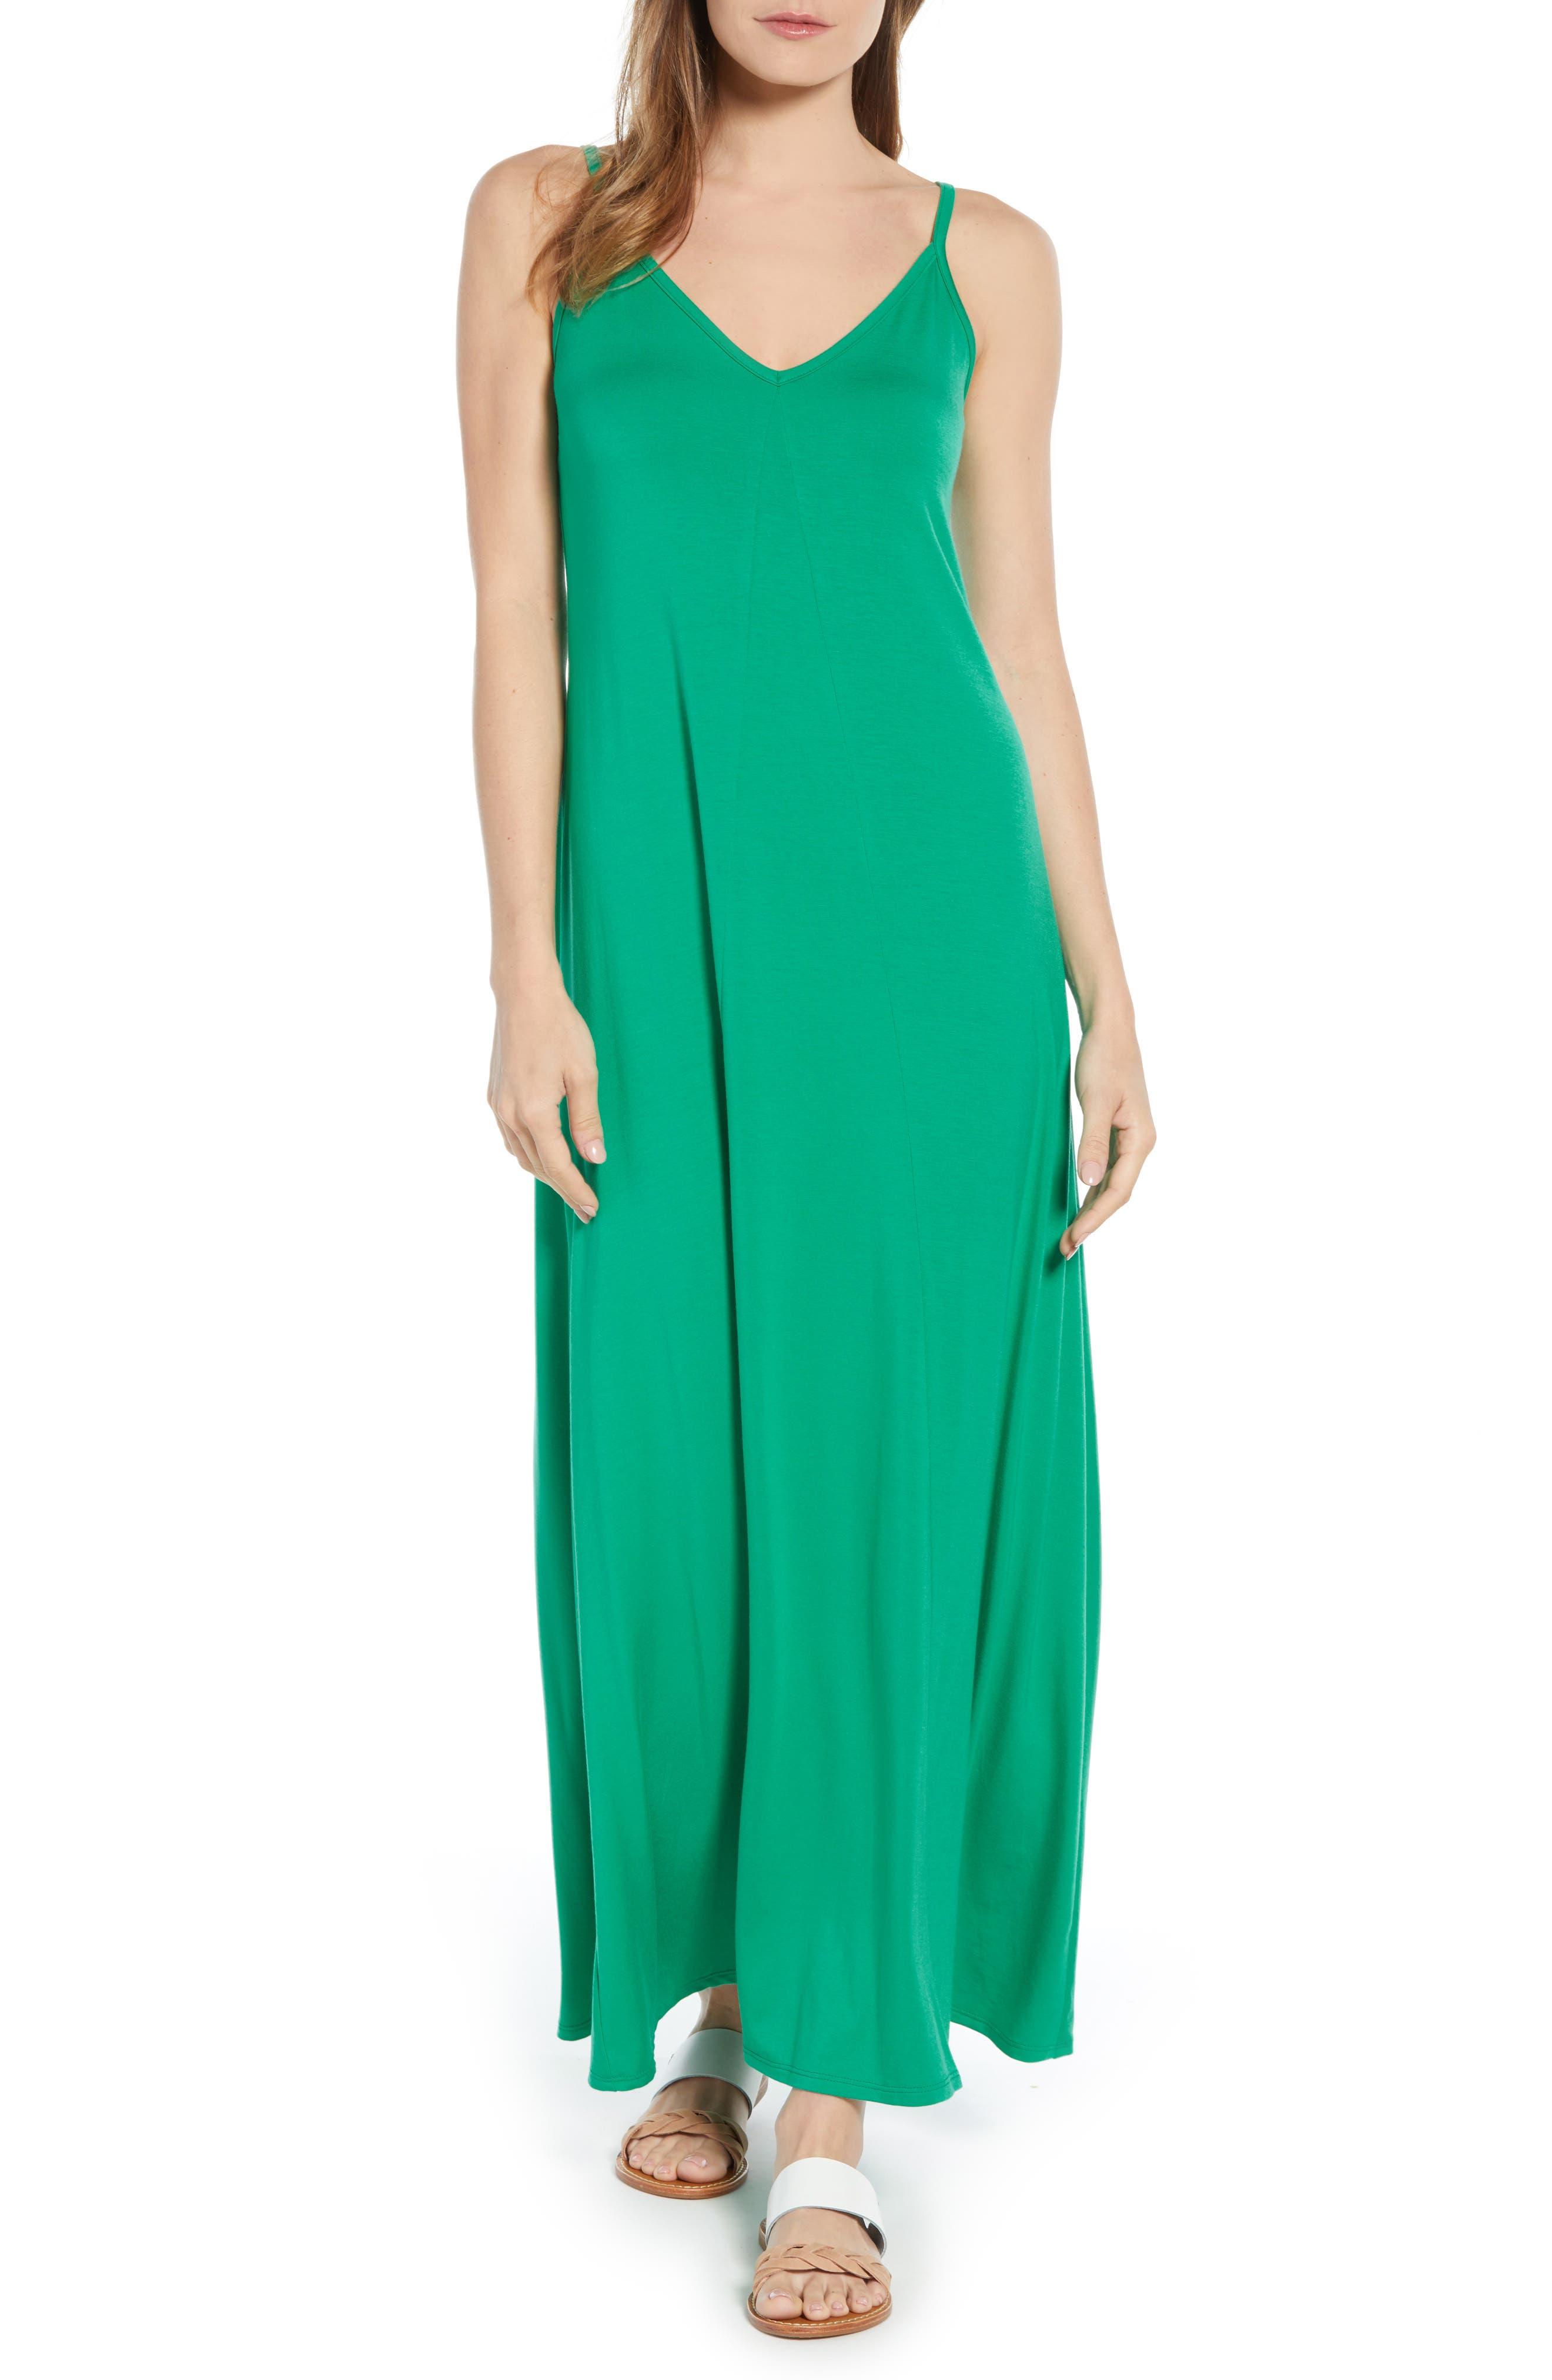 Petite Gibson X Living In Yellow Hazel Casual Knit Maxi Dress, Green (Regular & Petite) (Nordstrom Exclusive)